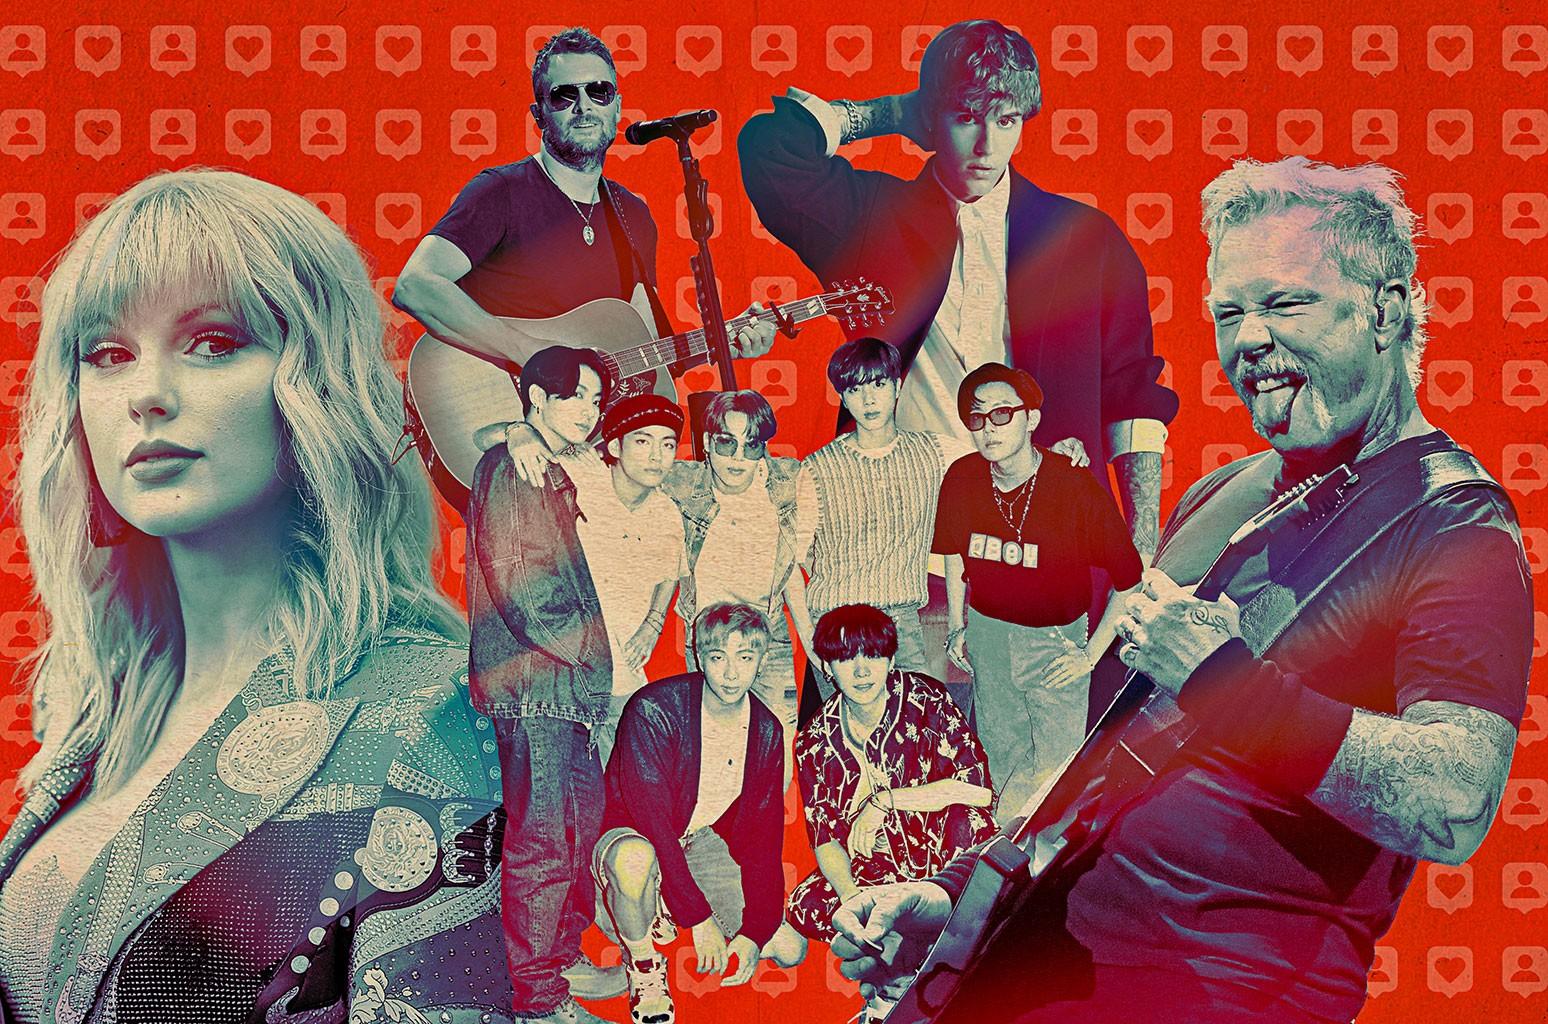 Taylor Swift, Eric Church, Justin Bieber, James Hetfield of Metallica, BTS